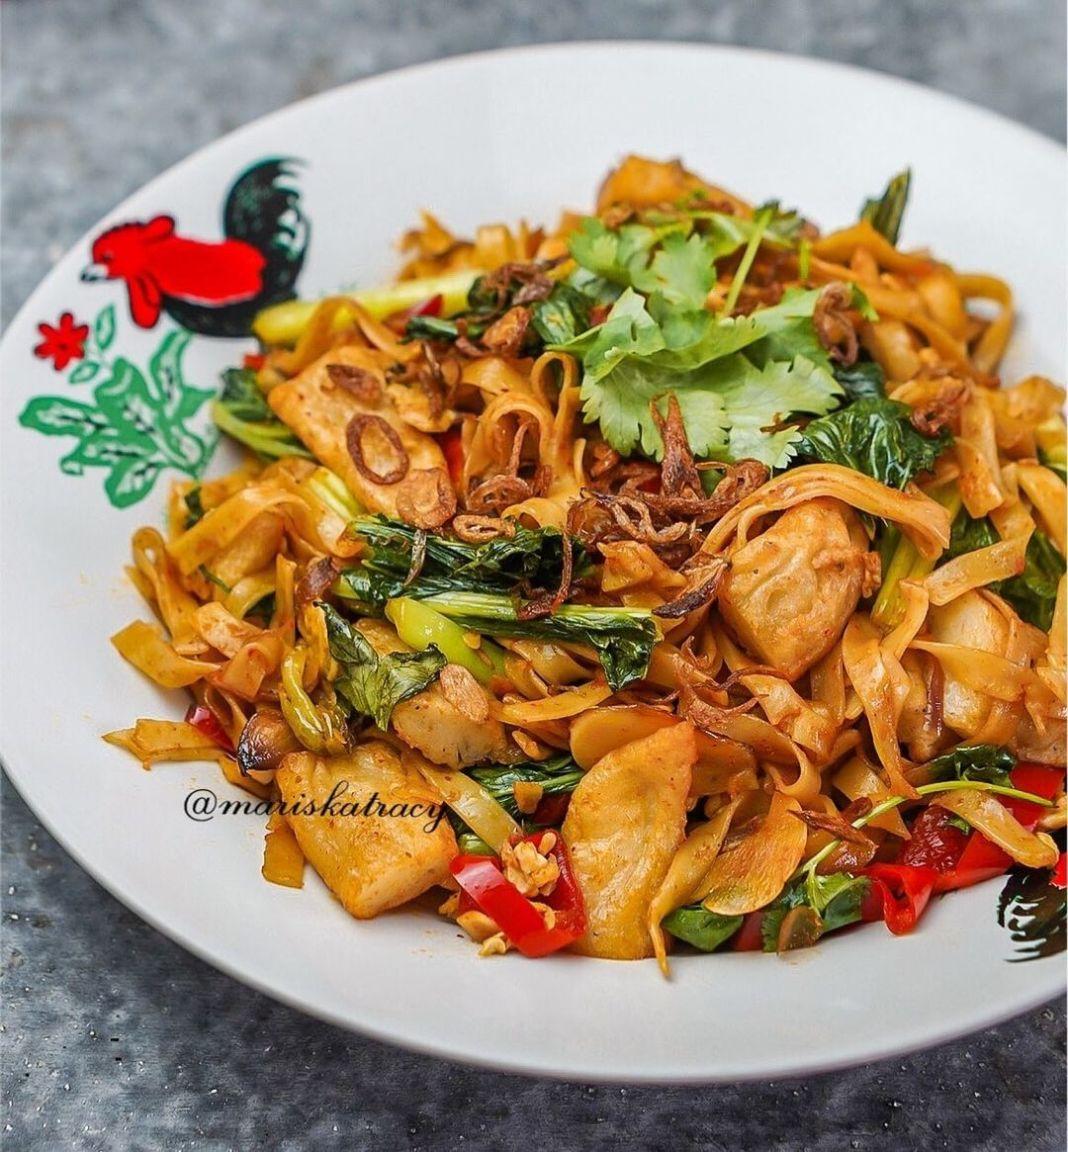 Info kuliner, Kwetiaw Goreng Tomyam Bikin kwetiaw ala-ala yang rasanya beda dari biasanya  Bahan: 1. 200 gram…